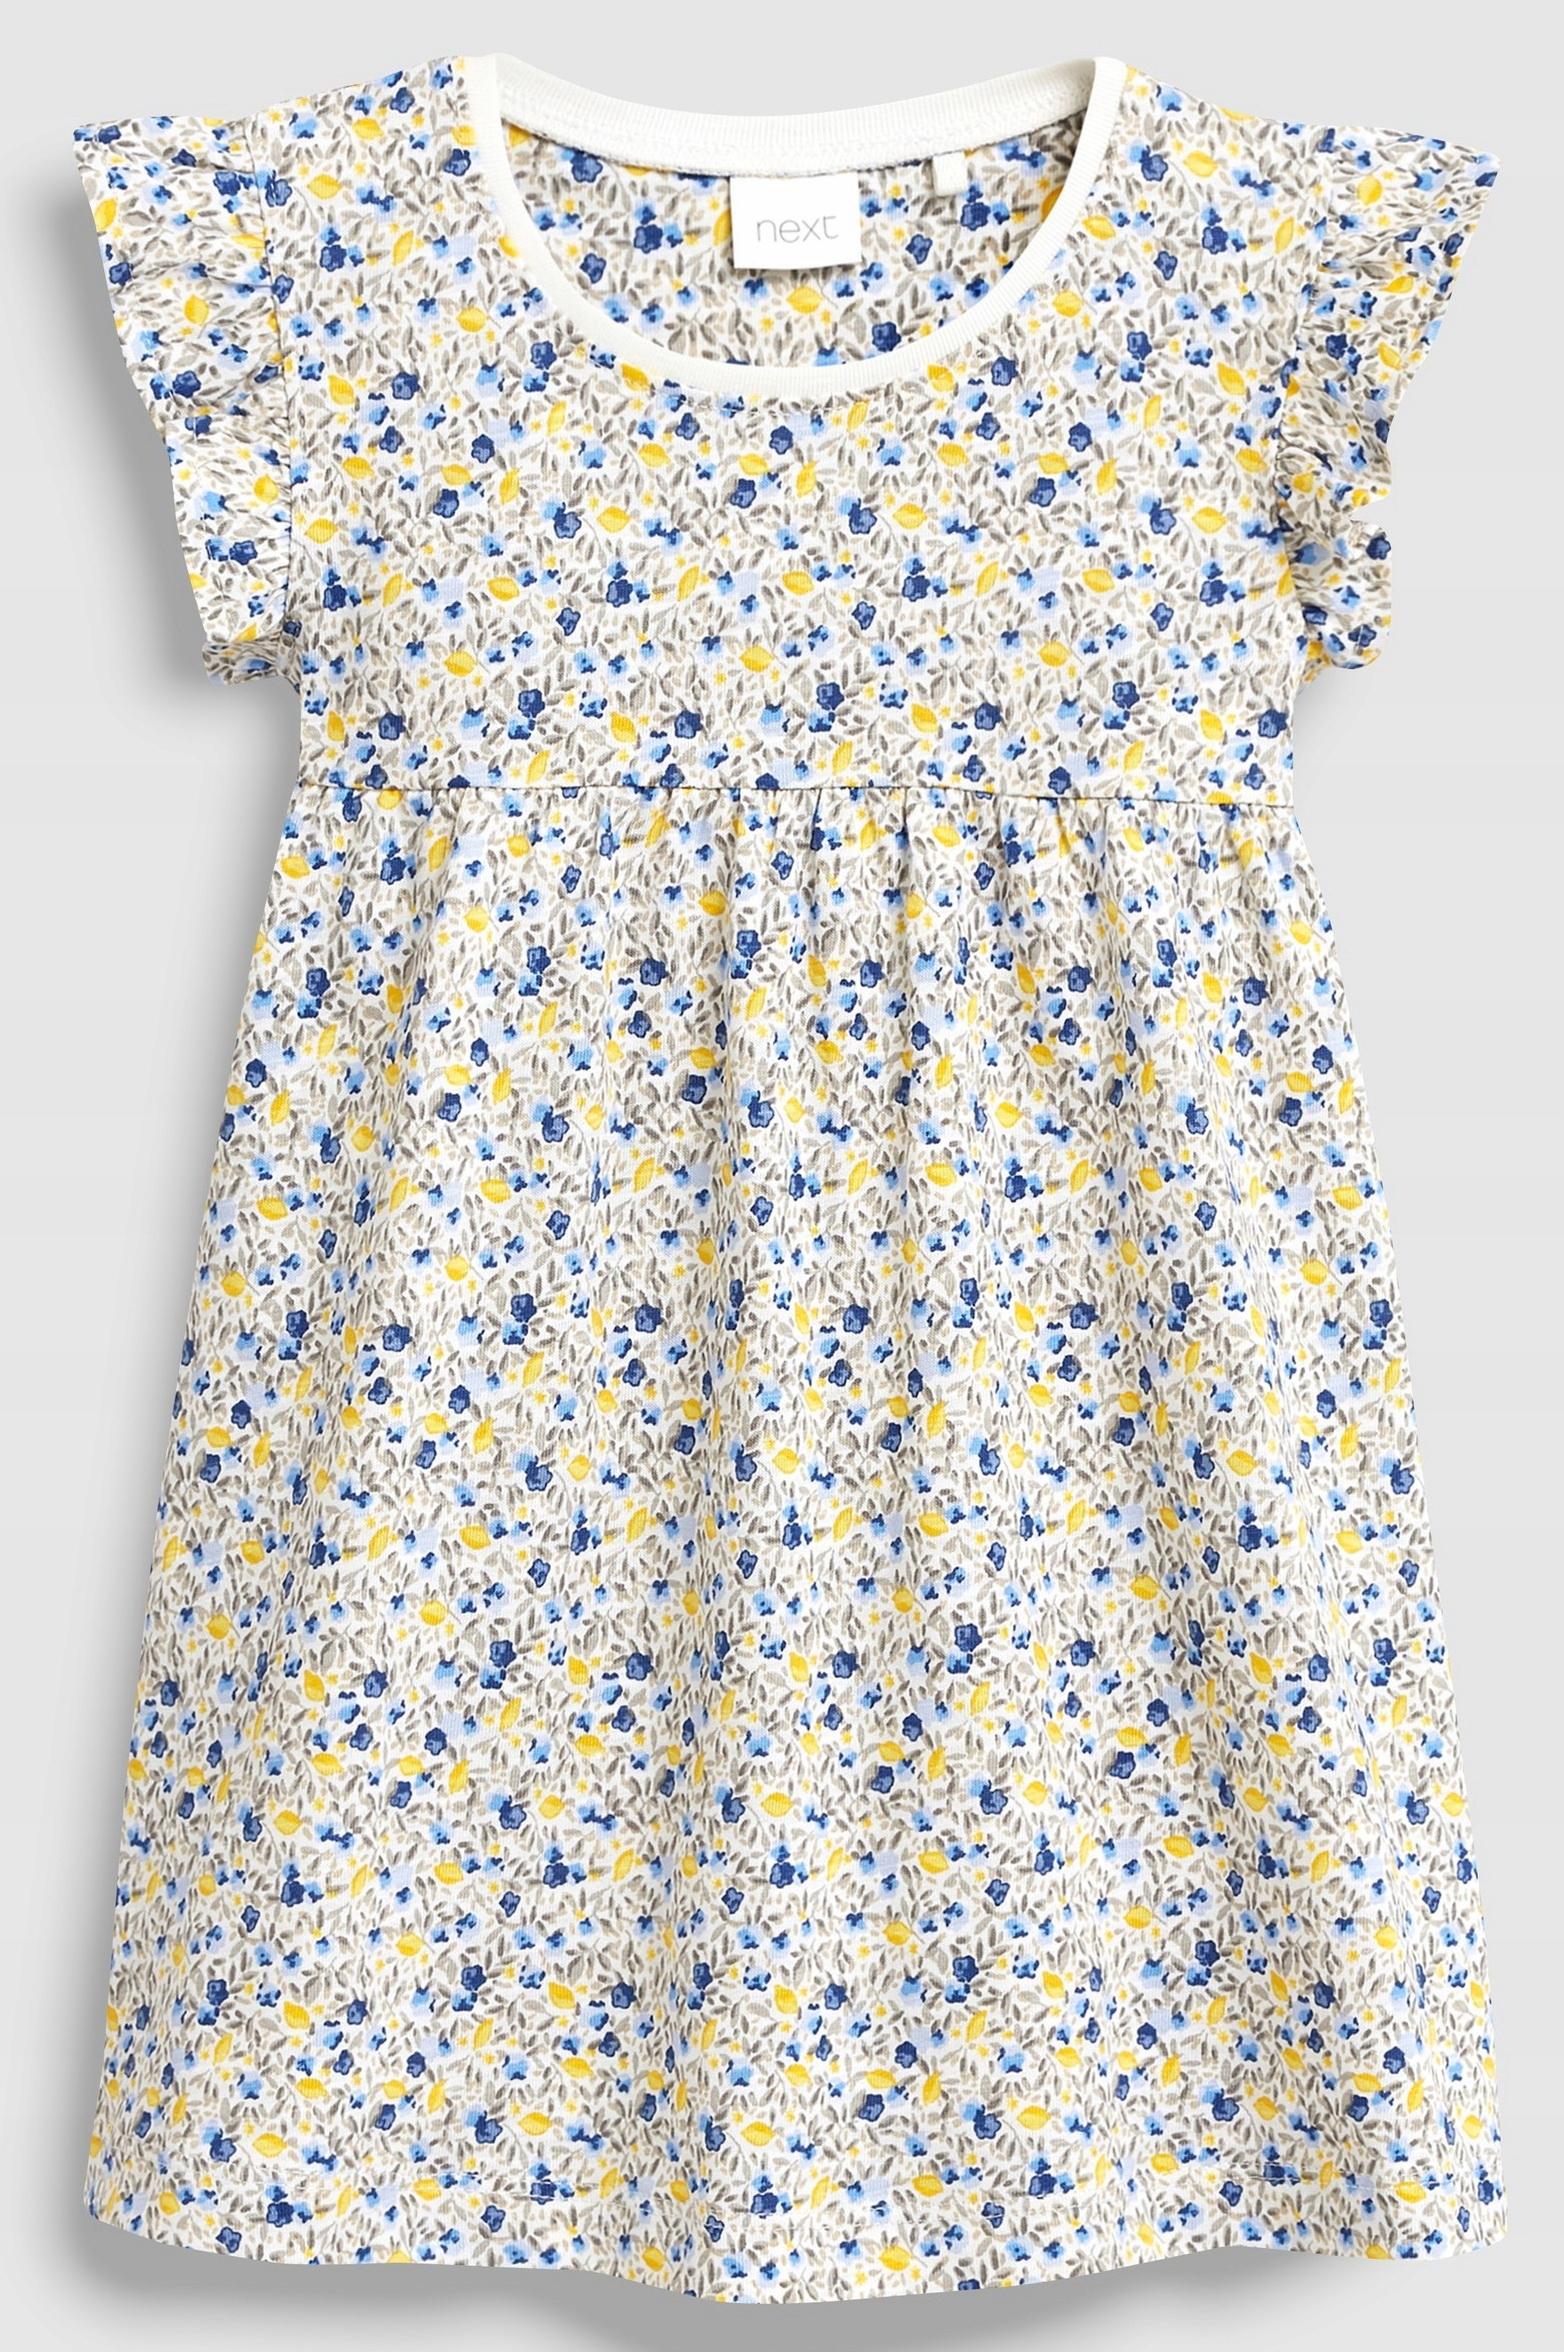 NEXT SUKIENKA Blue Yellow Ditsy 1,5-2 L 2019